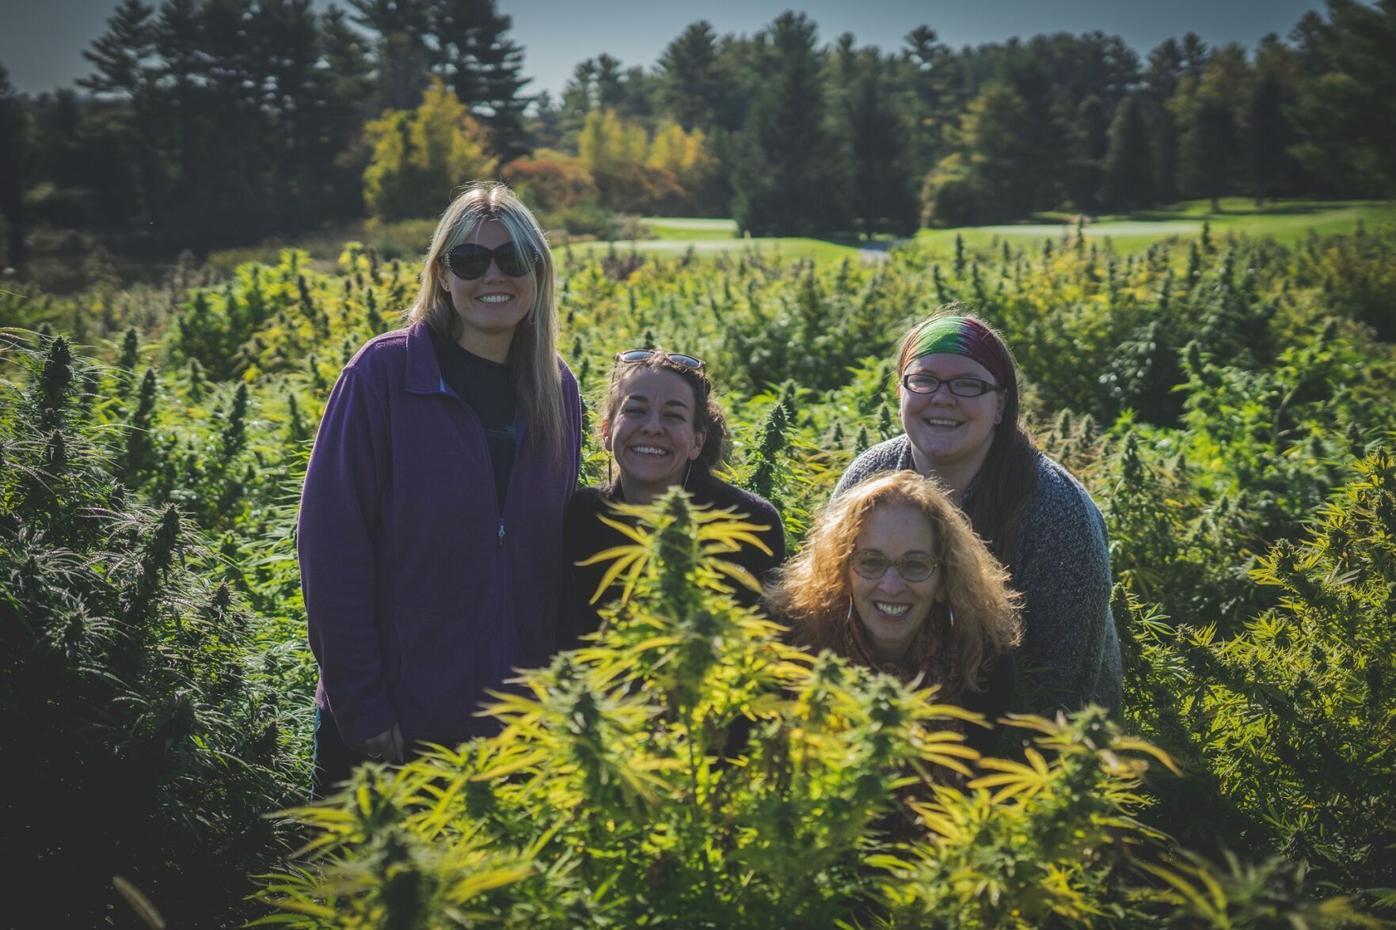 heady-vermont-team-photo-fall-2019-headies-site-visit-at-farm-fresh-hemp-essex.jpeg